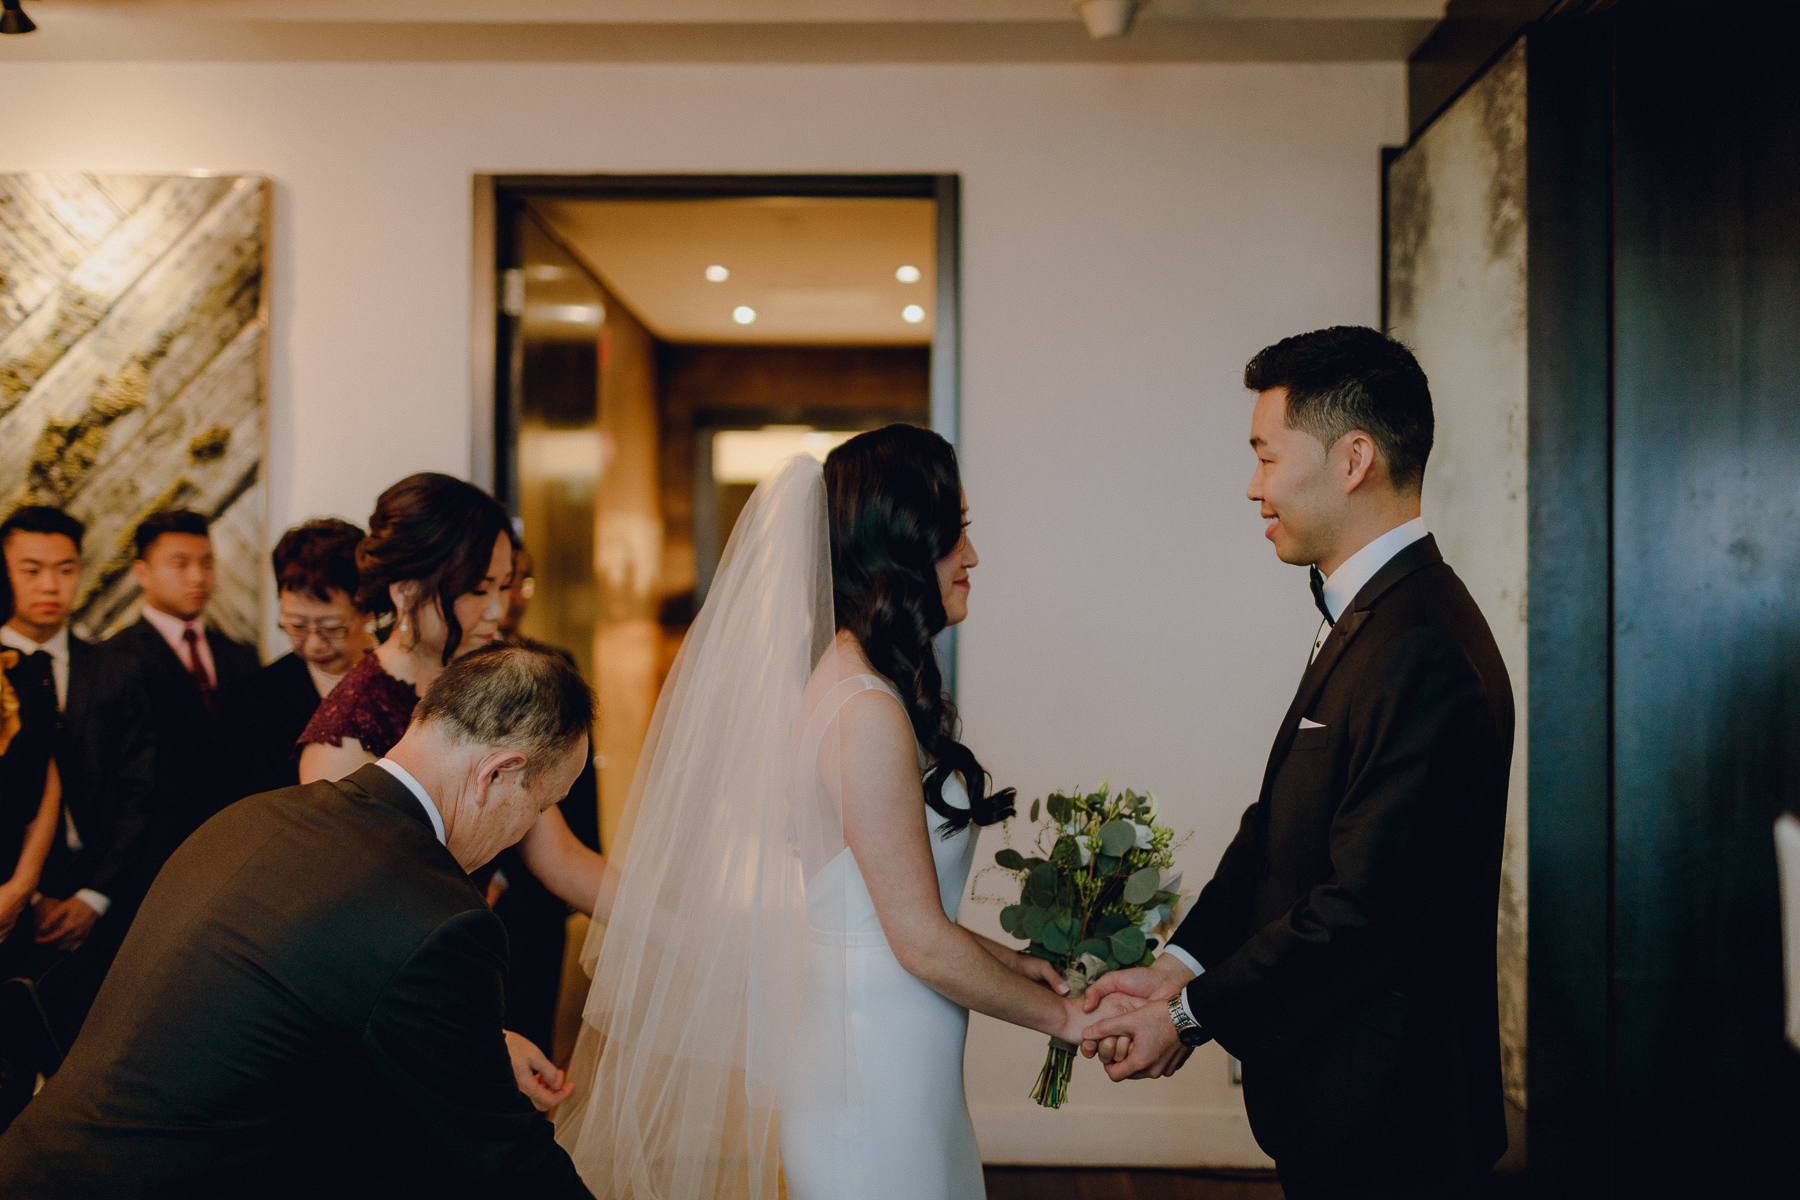 cannoe-restaurannt-wedding 0050.jpg